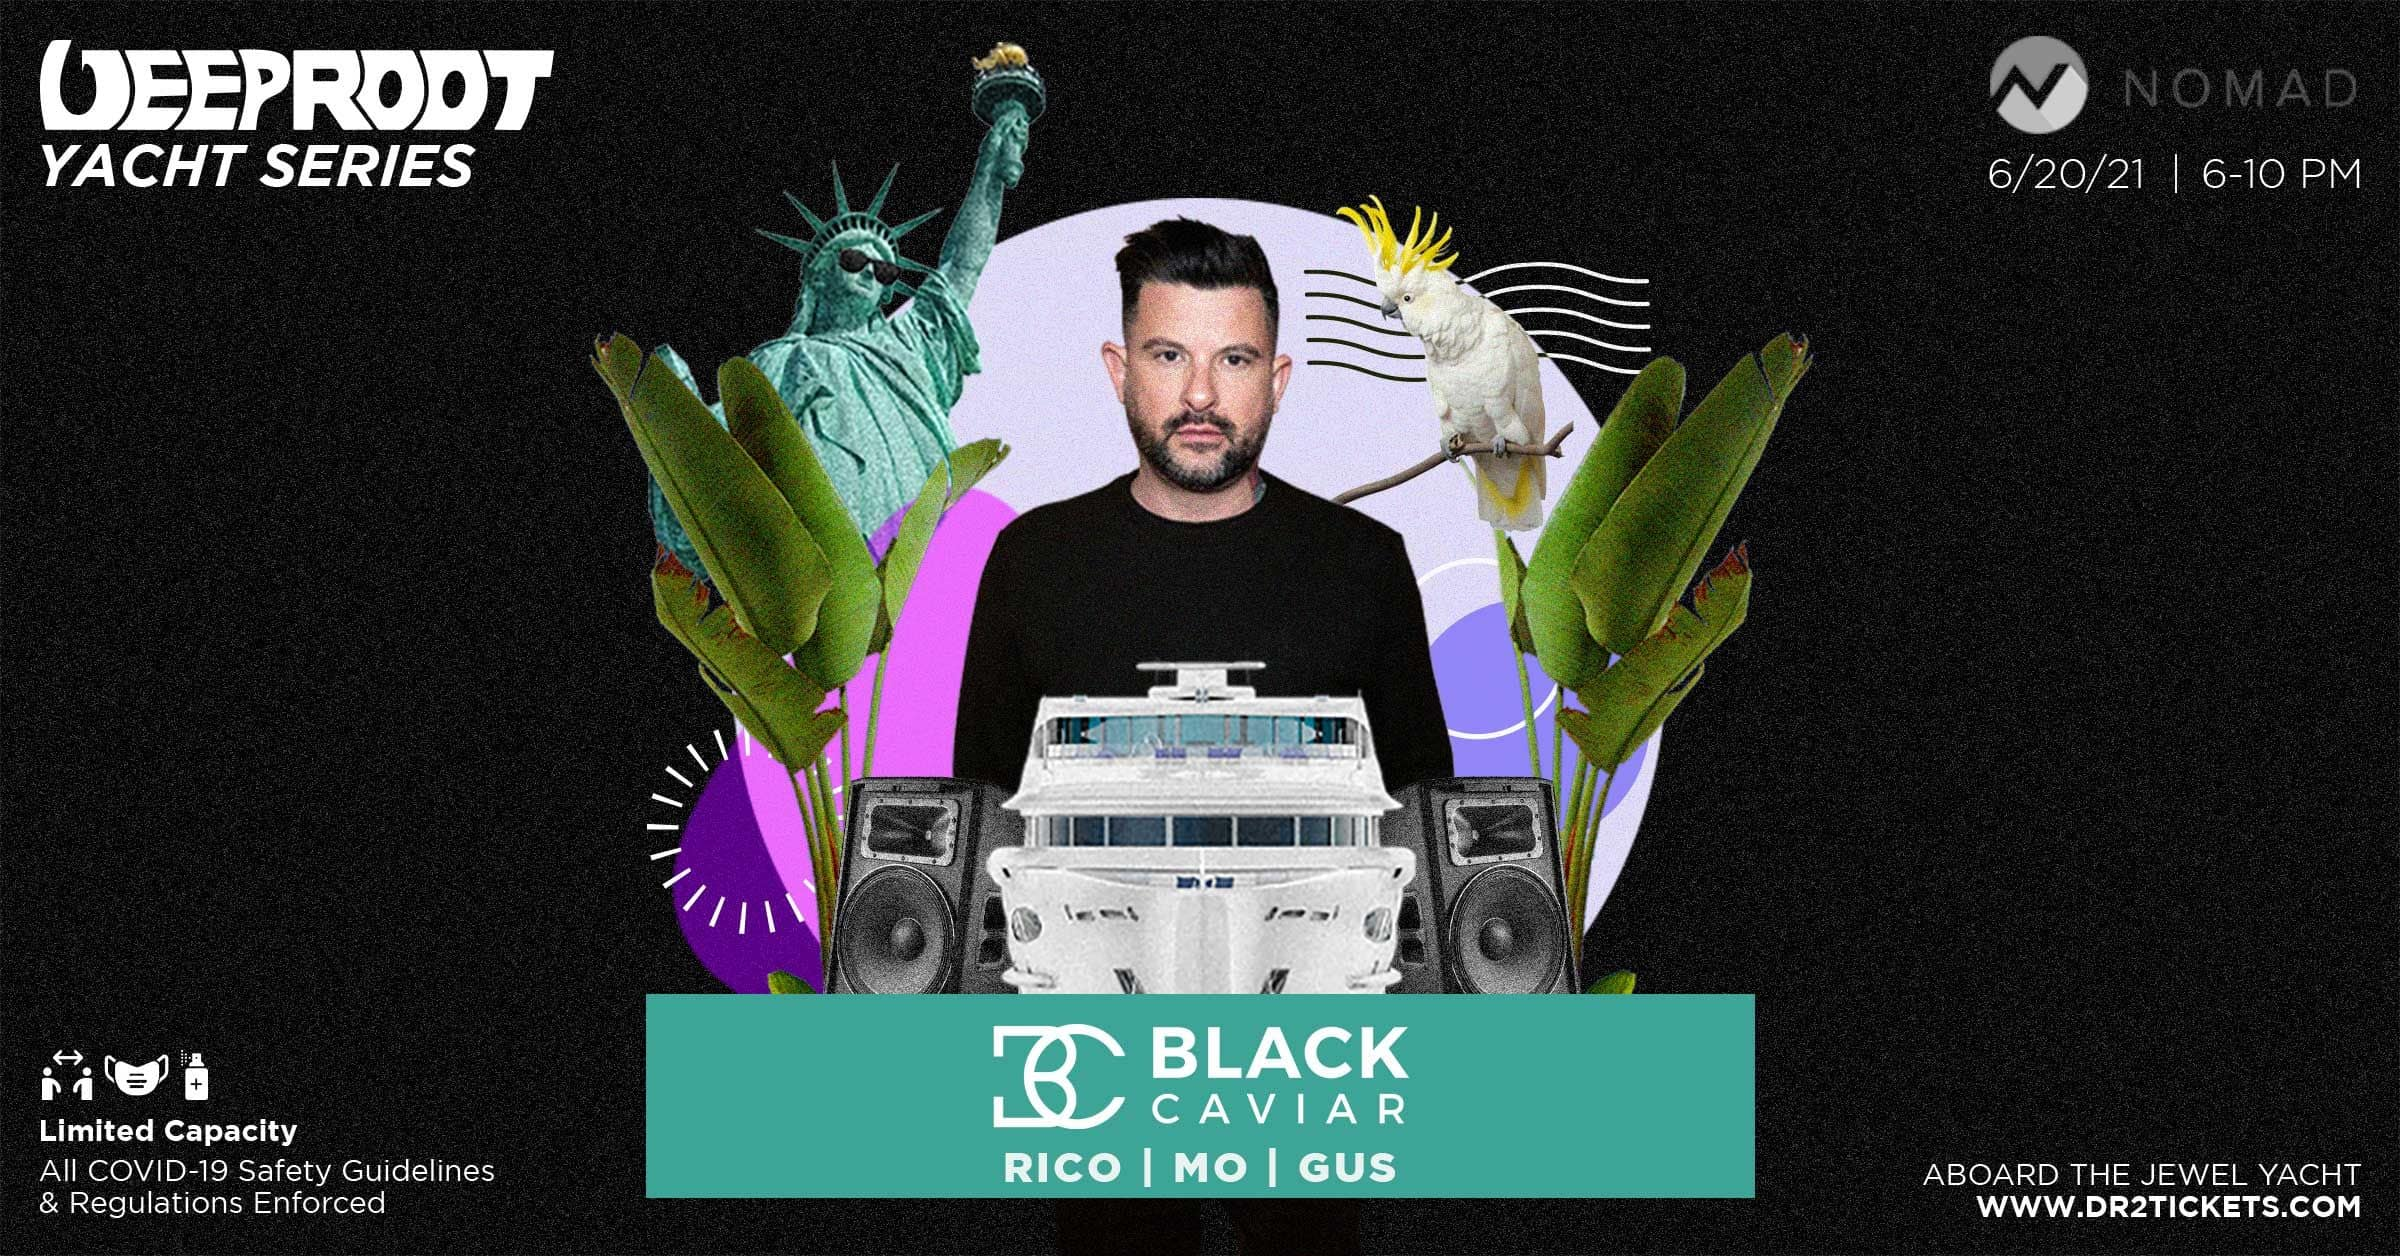 Deep Root x Nomad Yacht Cruise ft Black Caviar 6/20